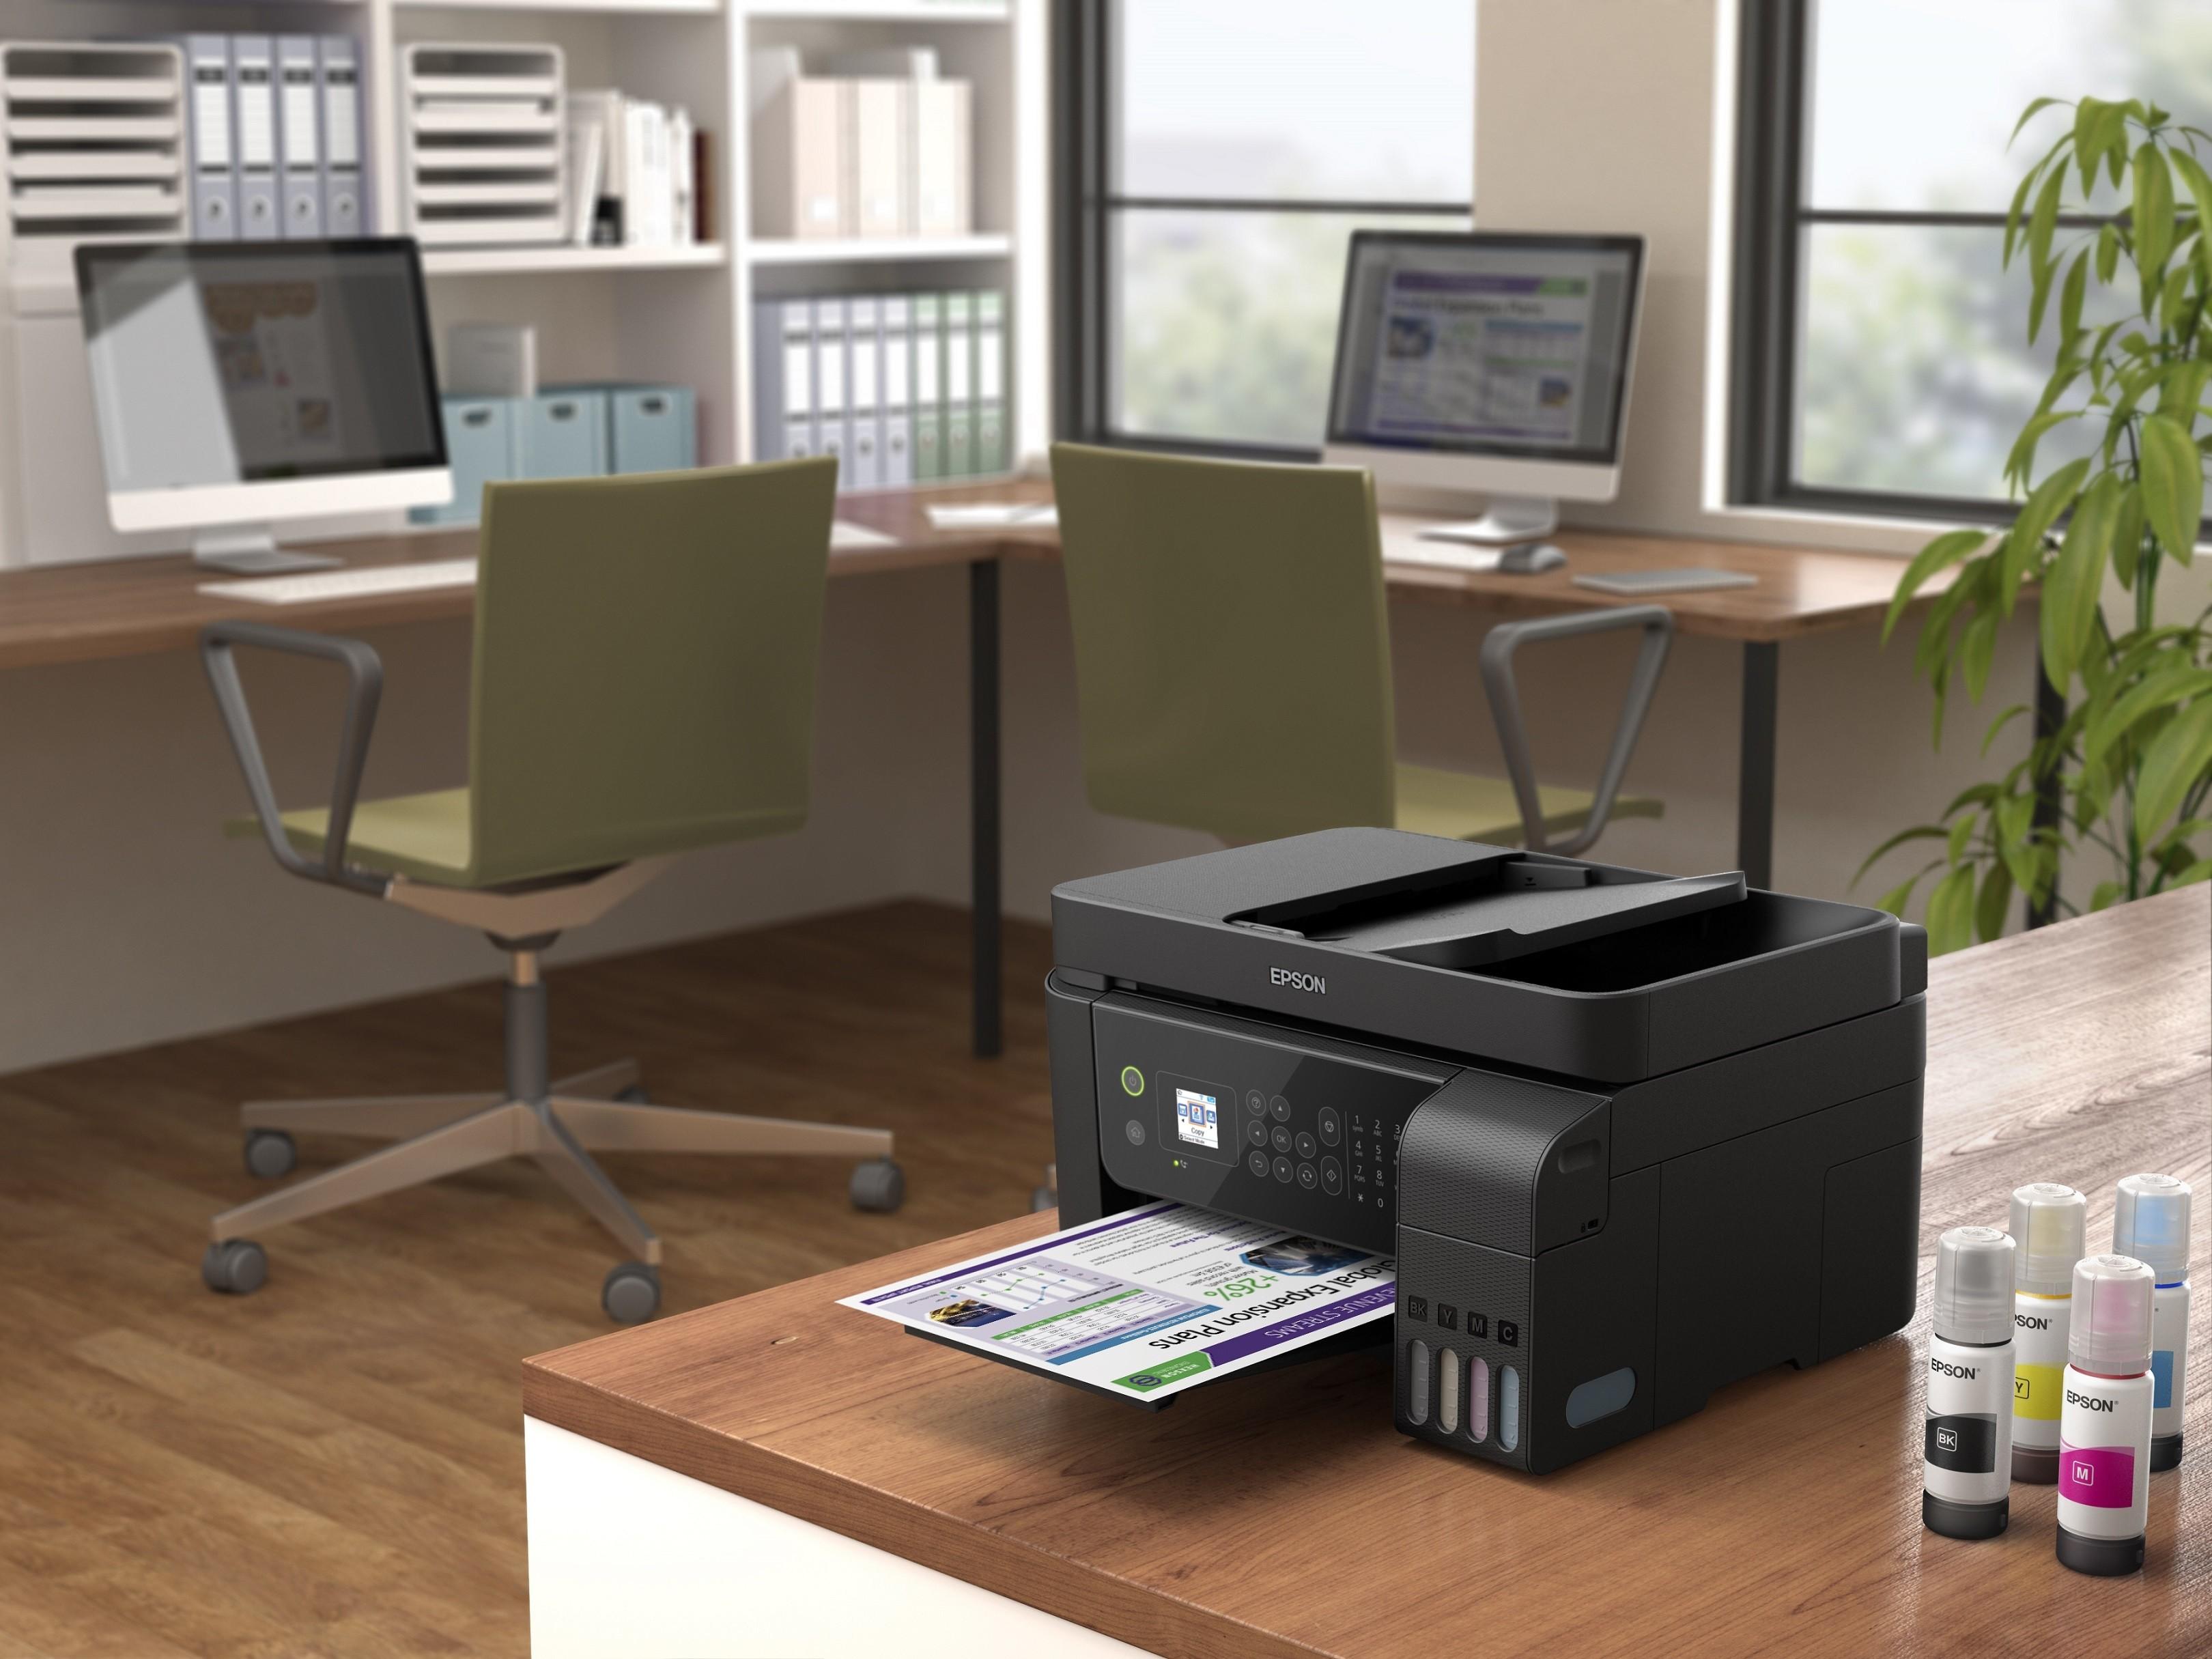 , Desk, Ink, Black, Printer, Inkjet printing, Epson, Desktop Computers, Office Supplies, White, Black, furniture, desk, office, product, personal computer, office supplies, product, desktop computer, table